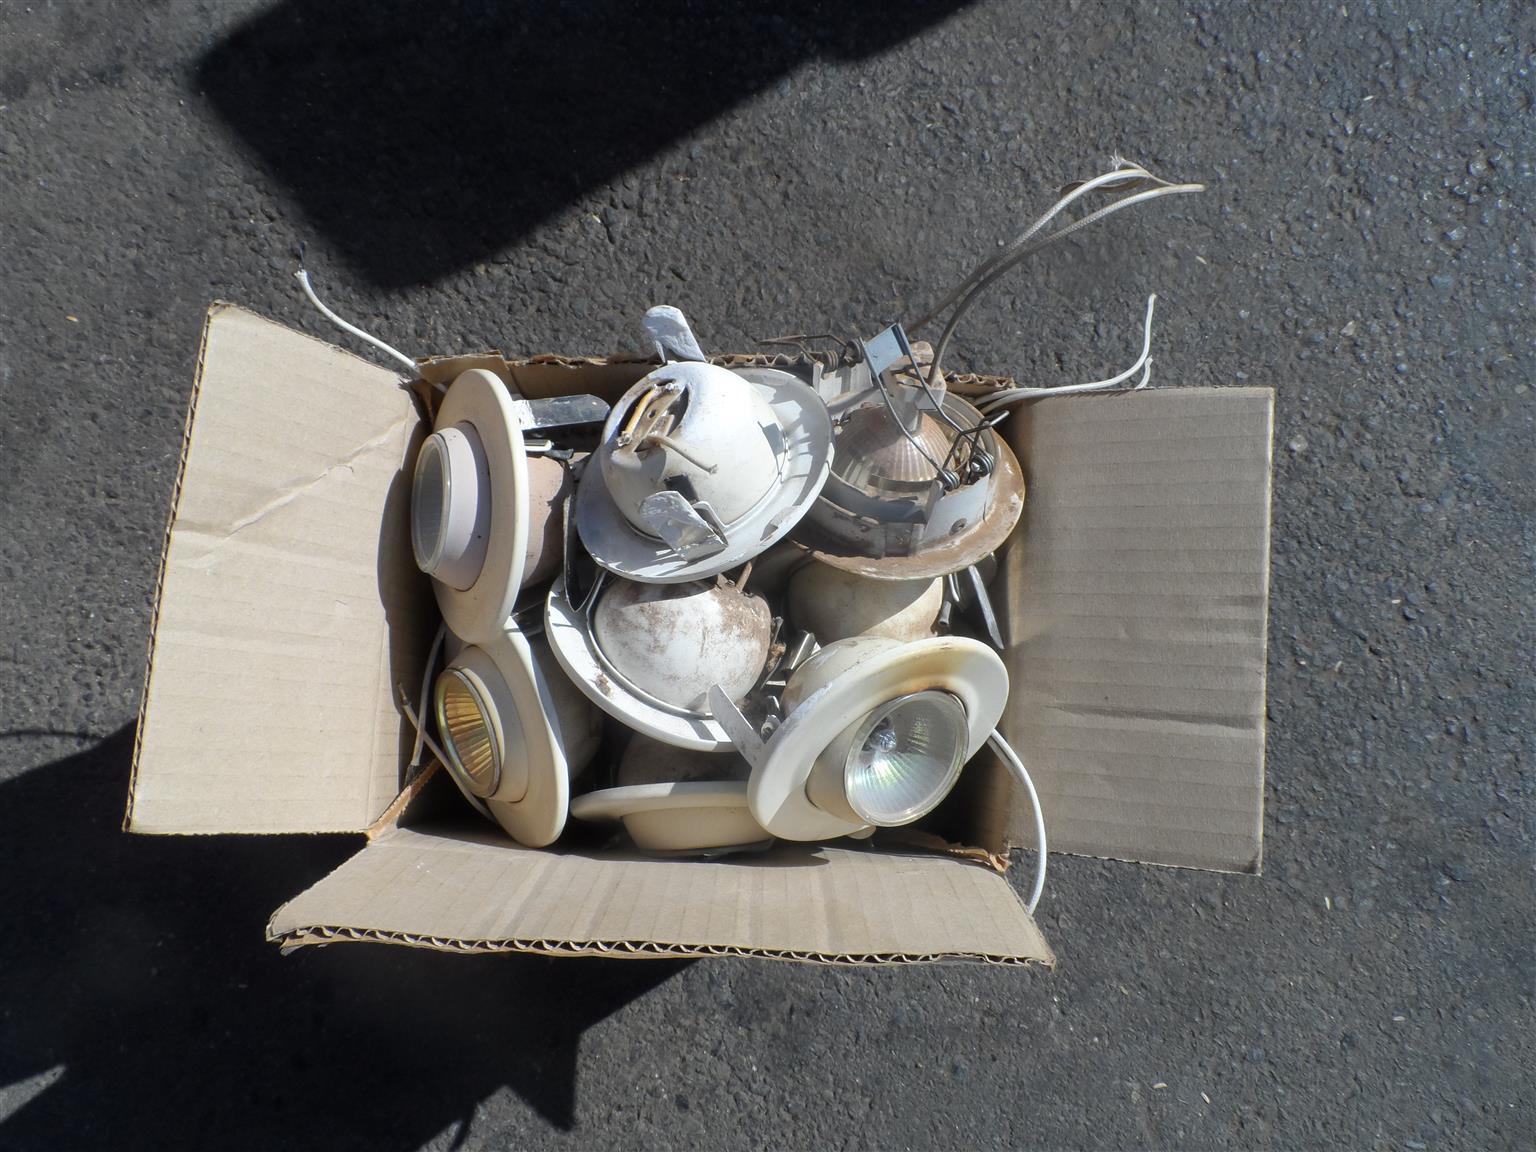 Job lot of globes, ceiling lights, etc. for sale,